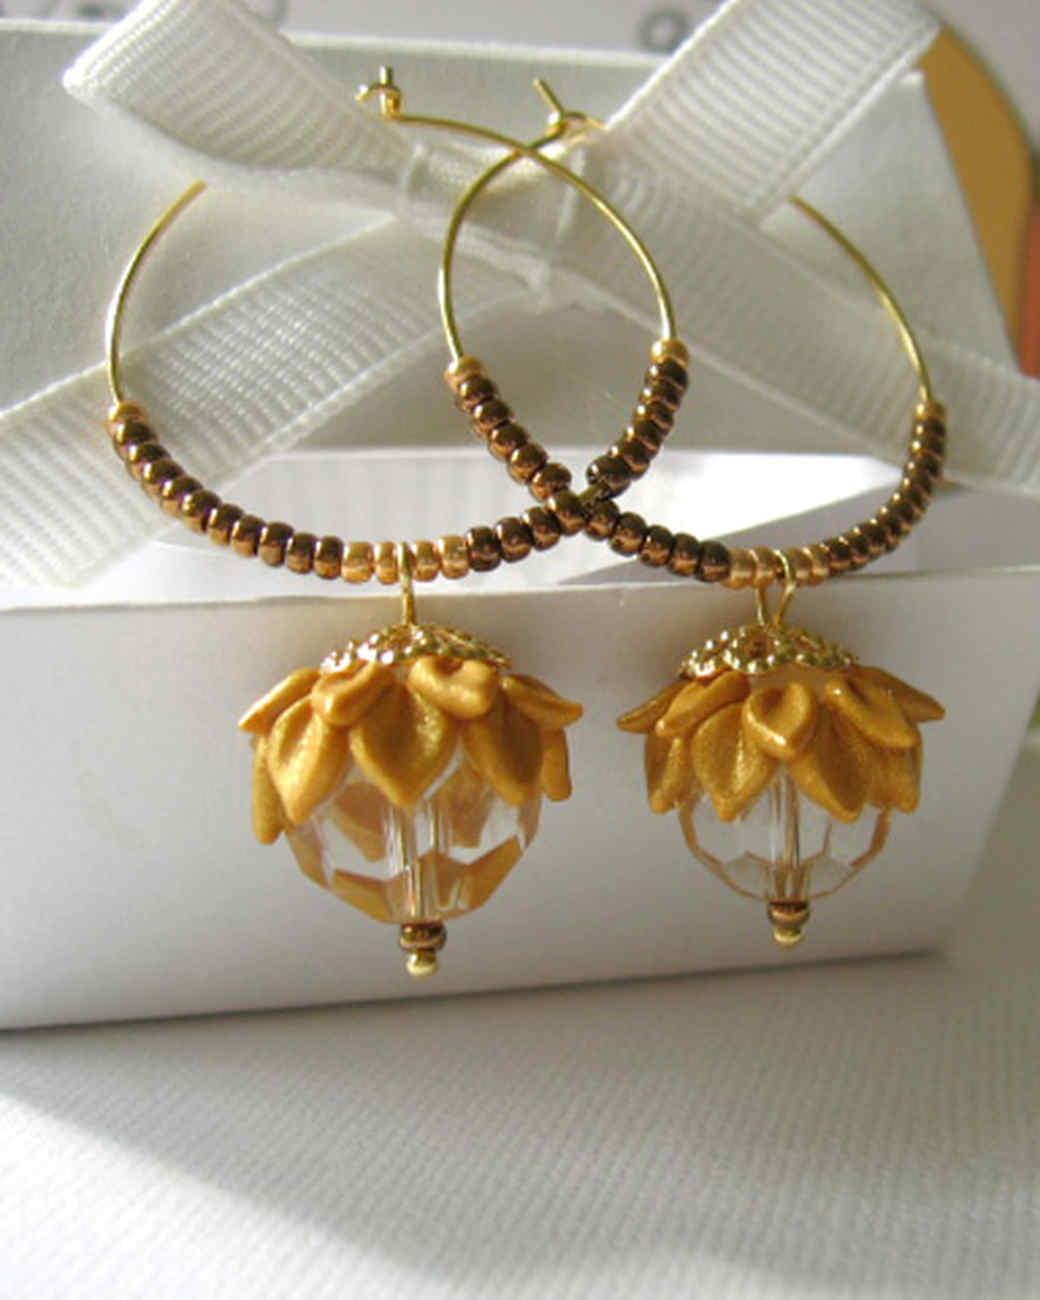 crafter_earrings.jpg